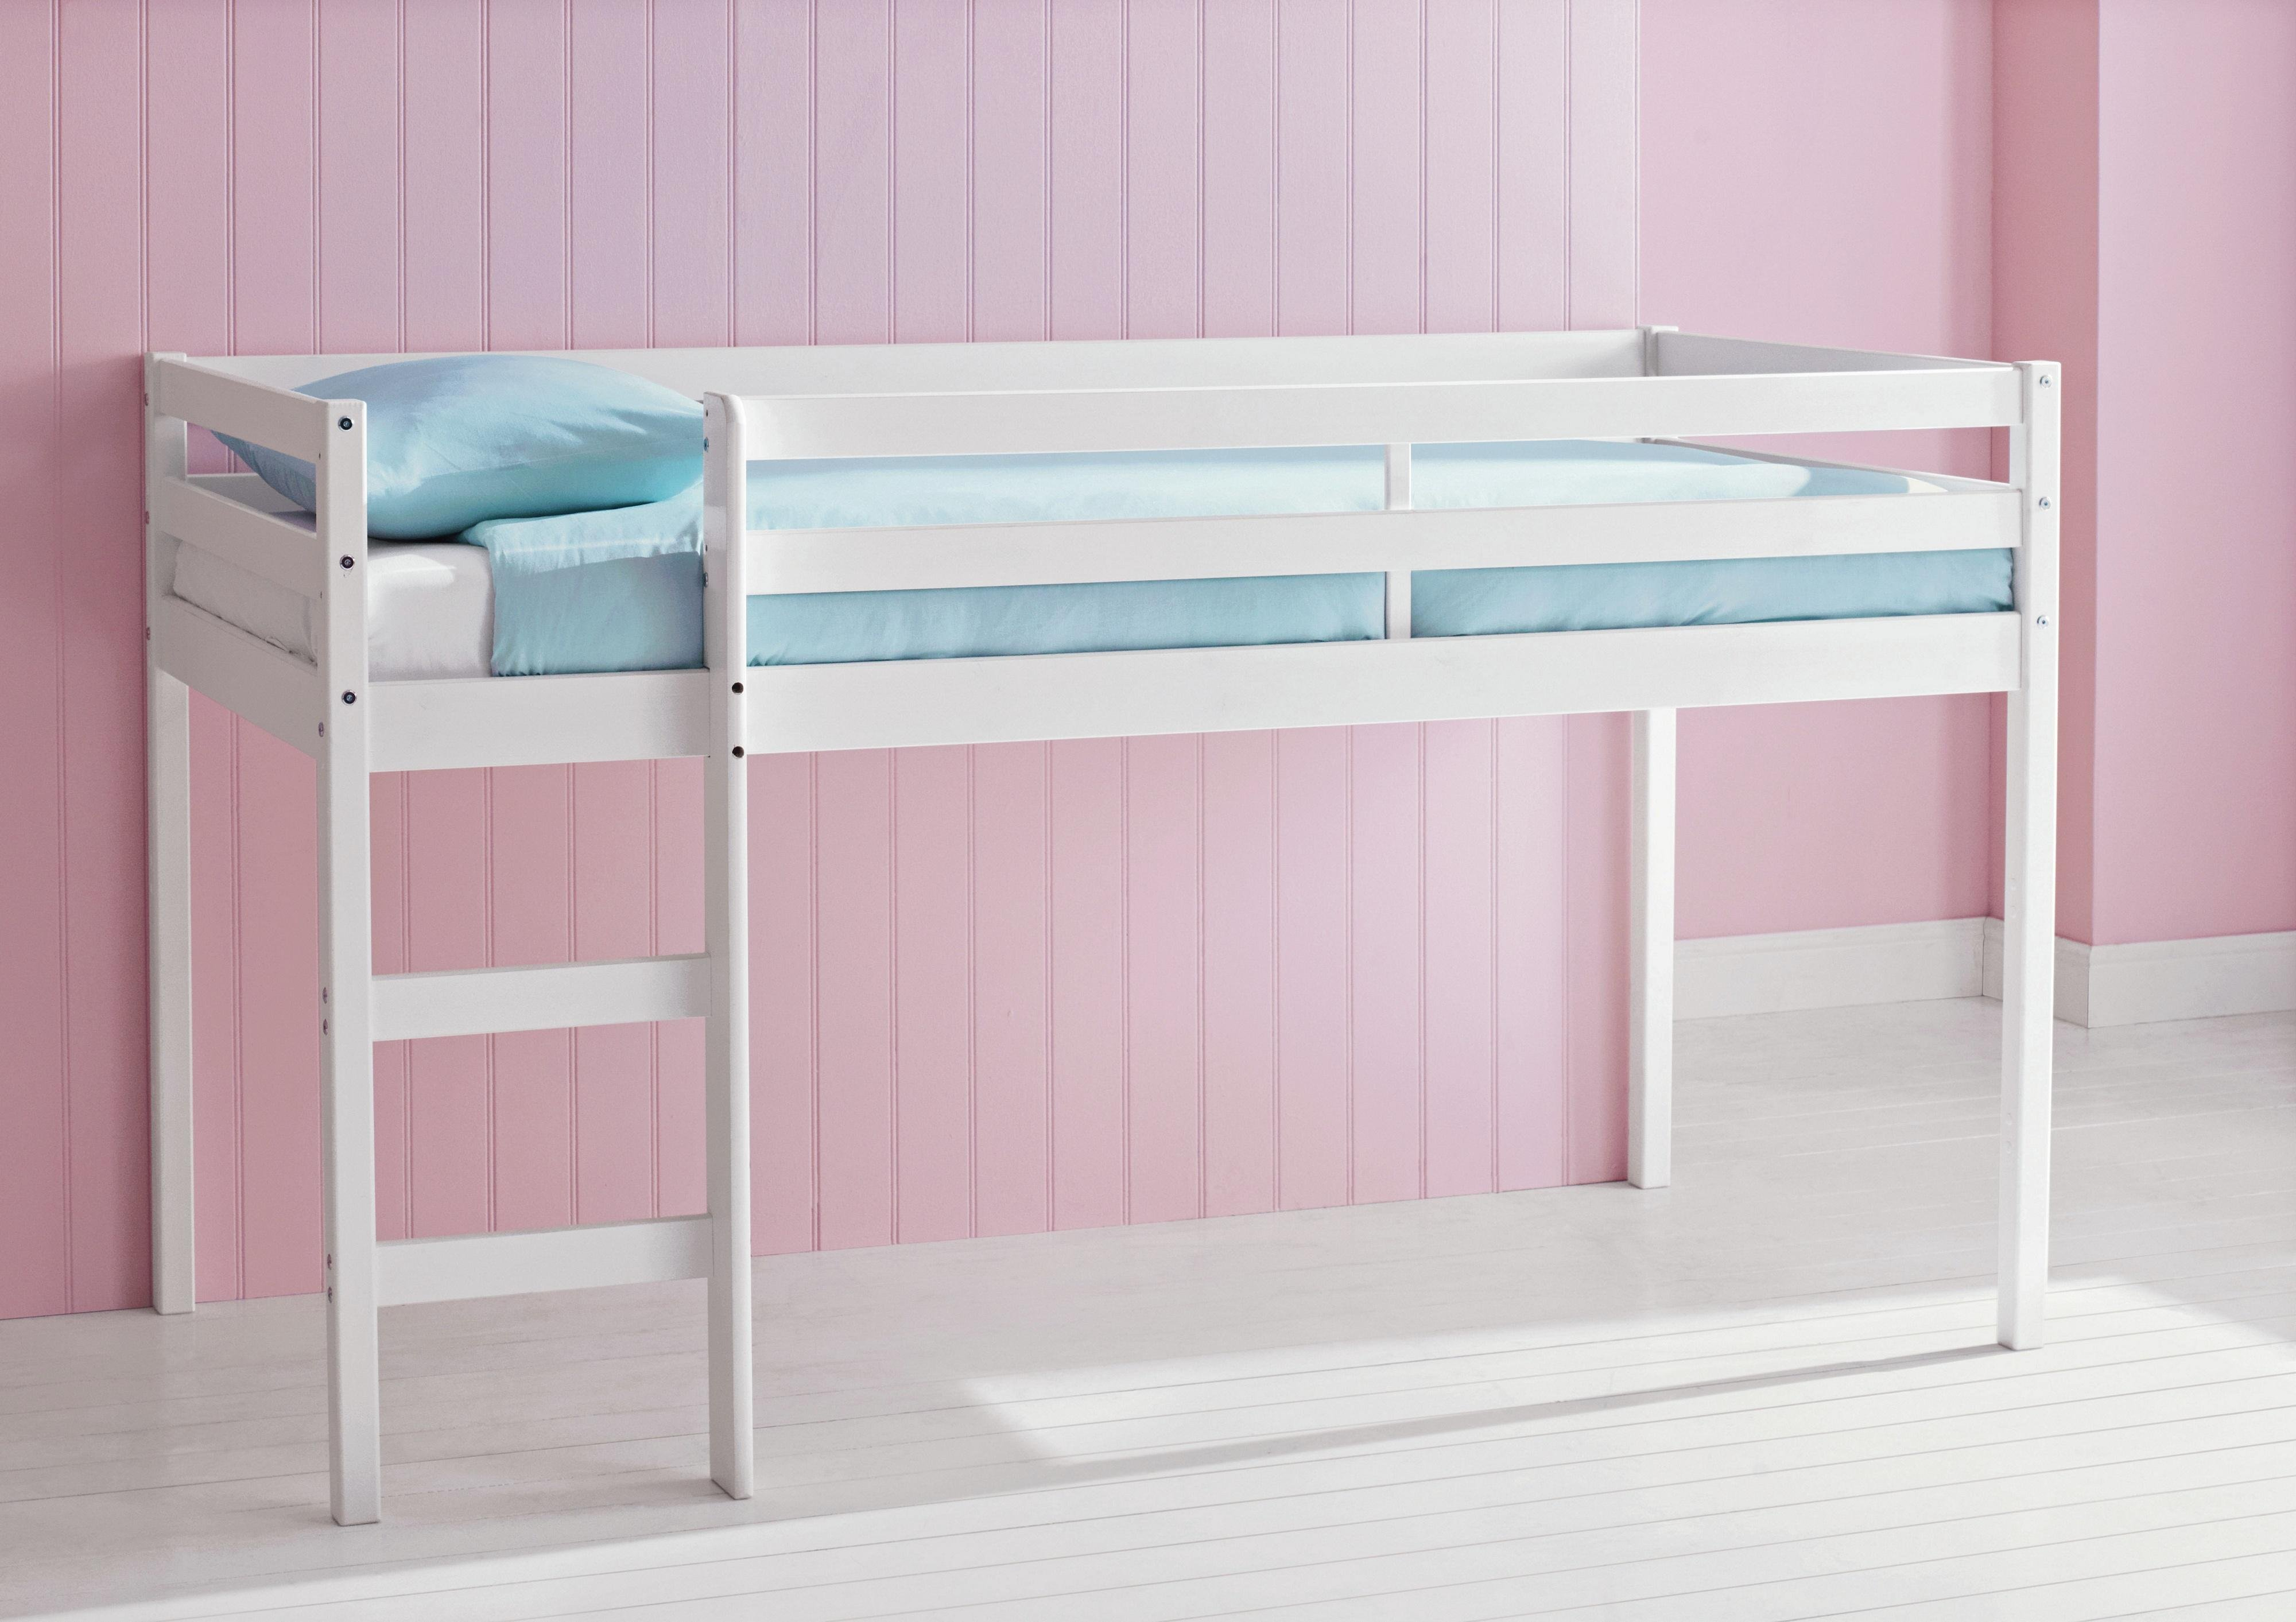 Argos Home Kaycie Shorty Mid Sleeper with Mattress - White